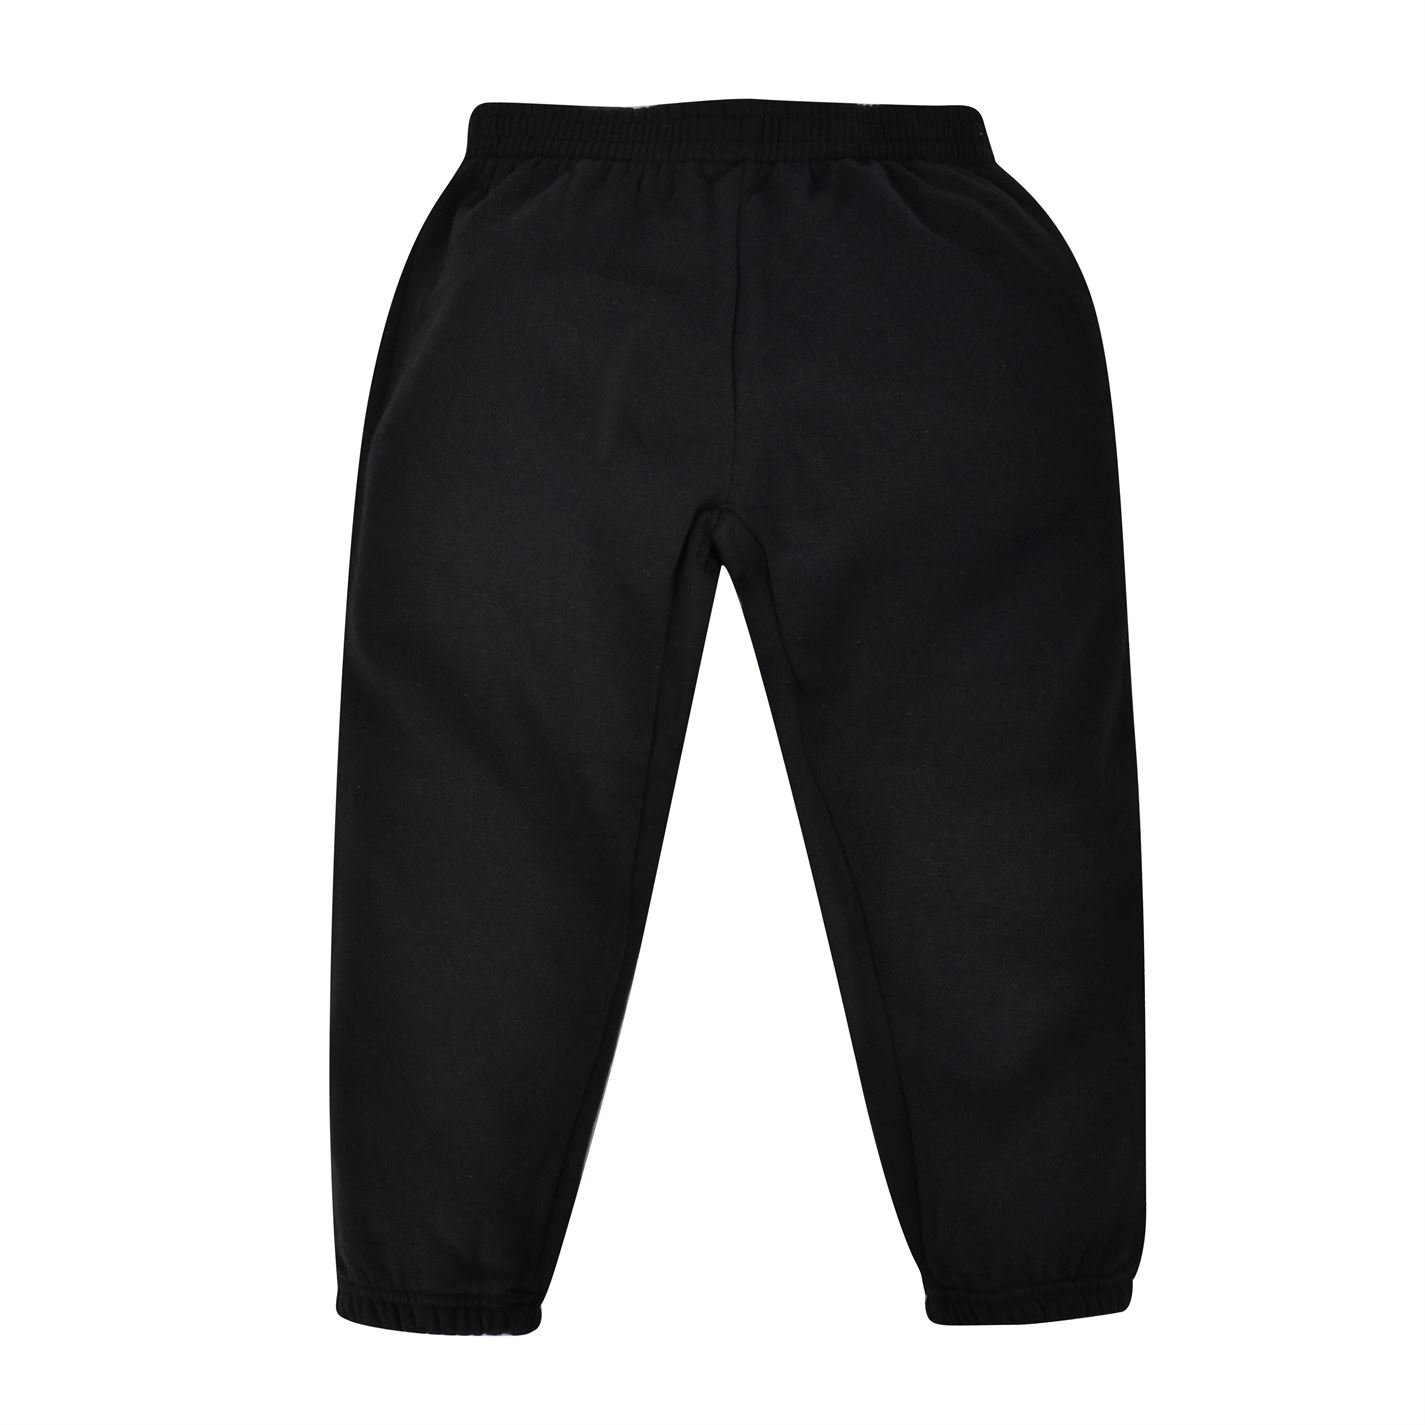 Crafted Bambini Pile Pantaloni Unisex Heatons Ragazzi Sport Elasticizzati